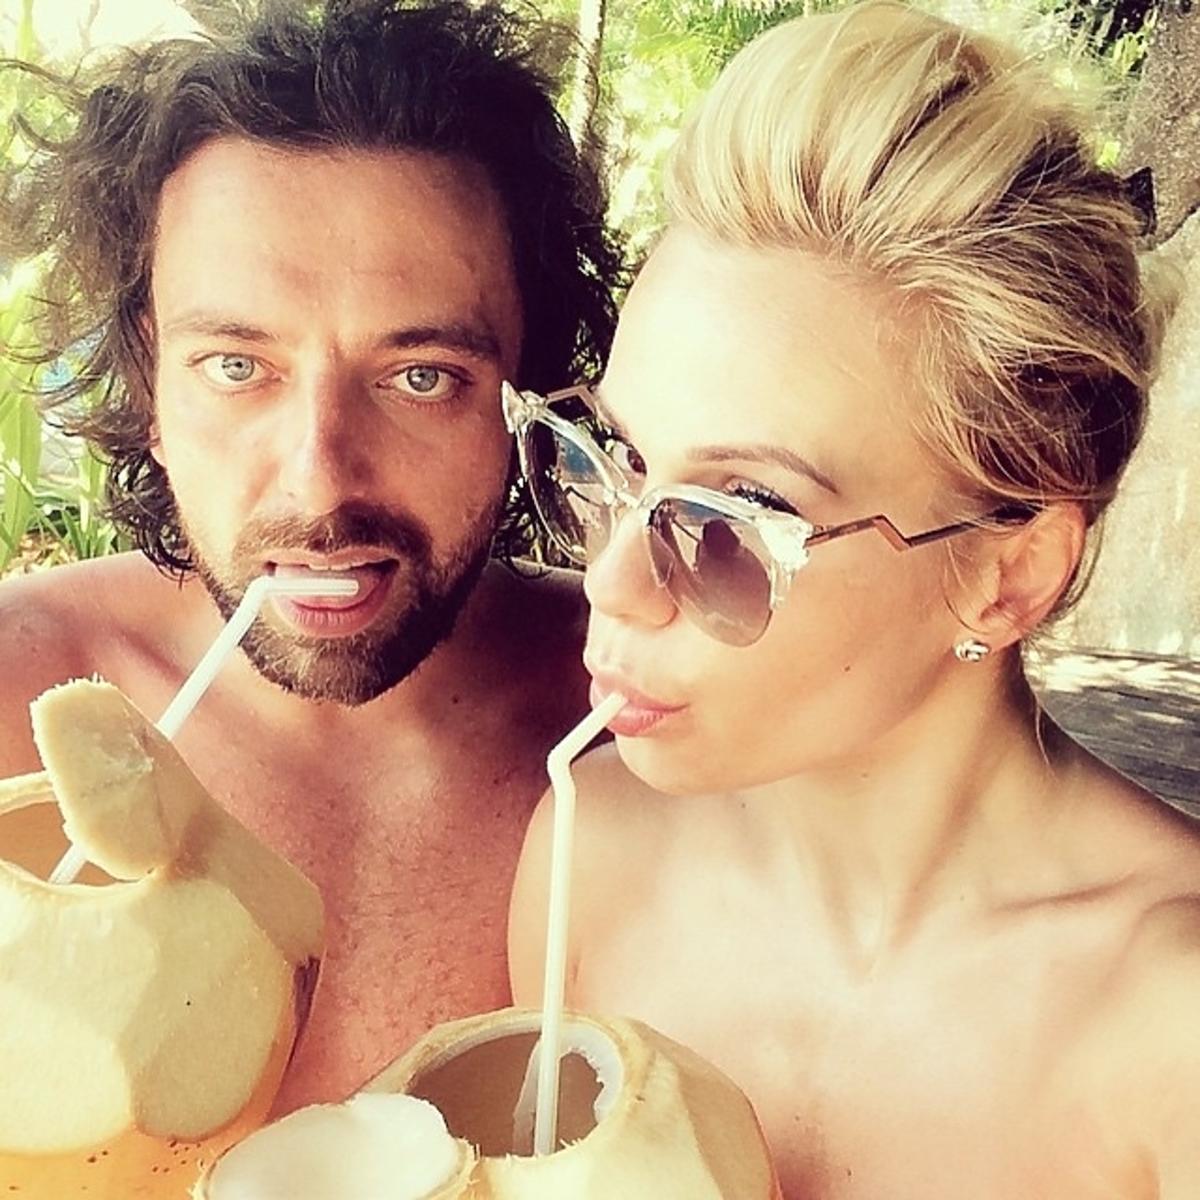 Doda i Emil Haidar na wakacjach